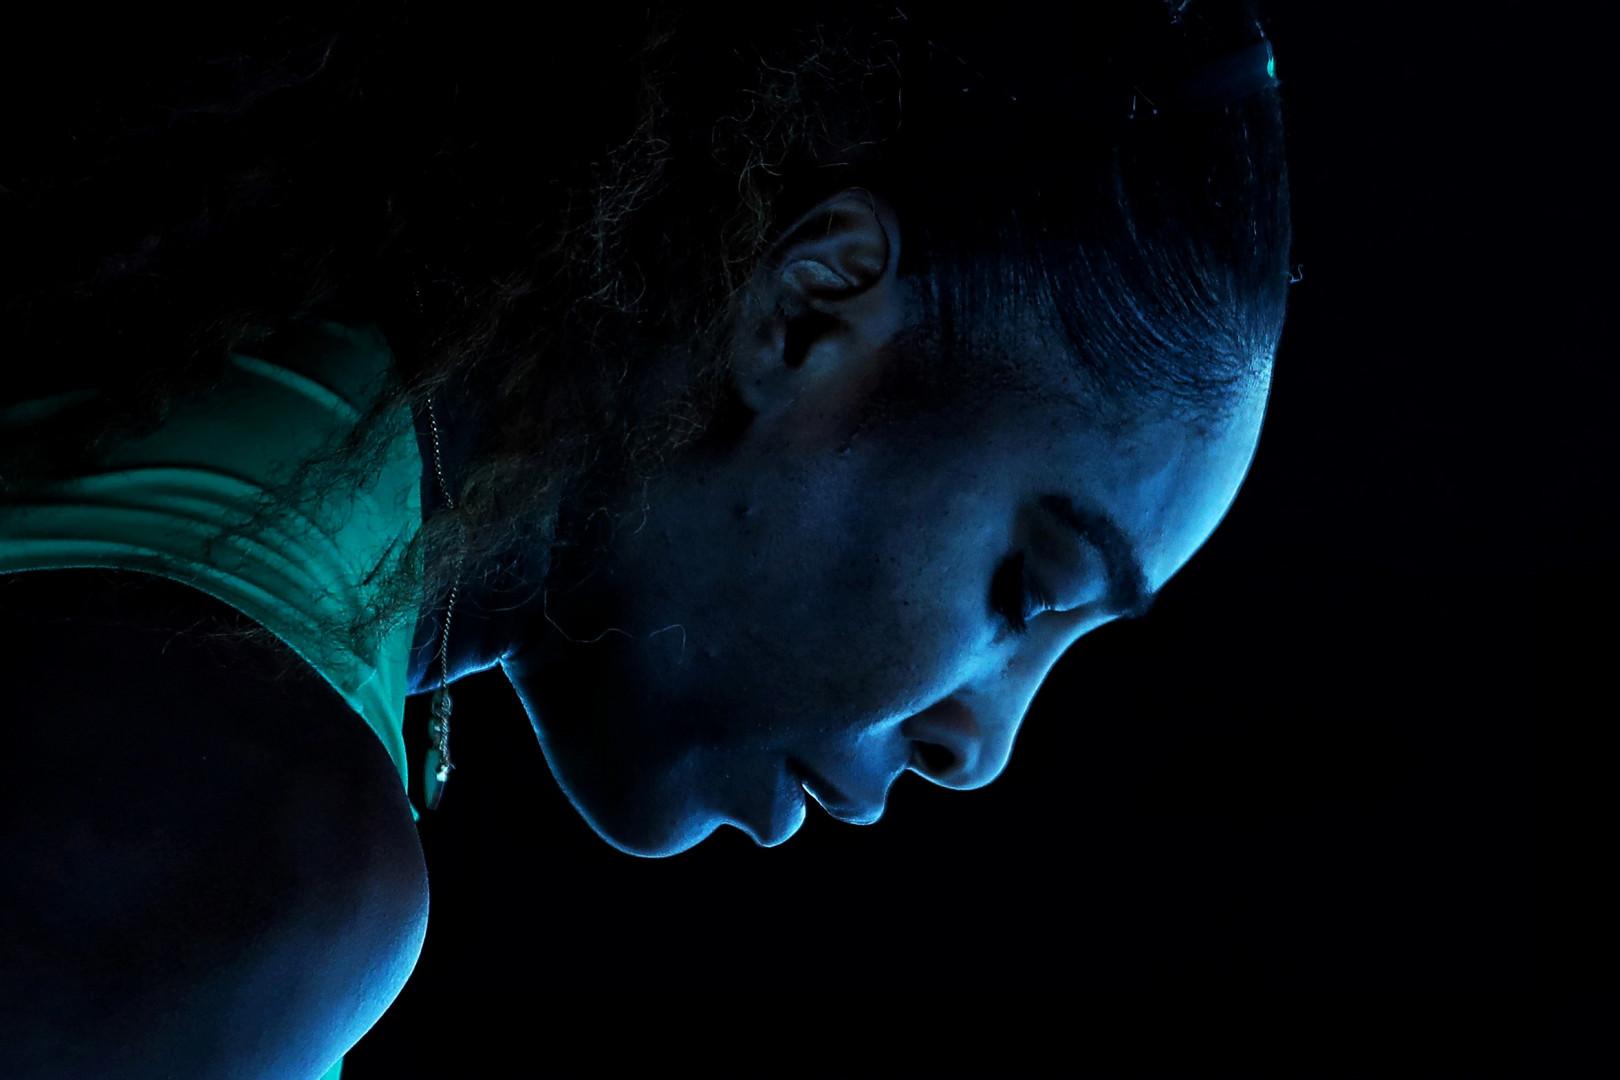 Serene Serena (optimized)